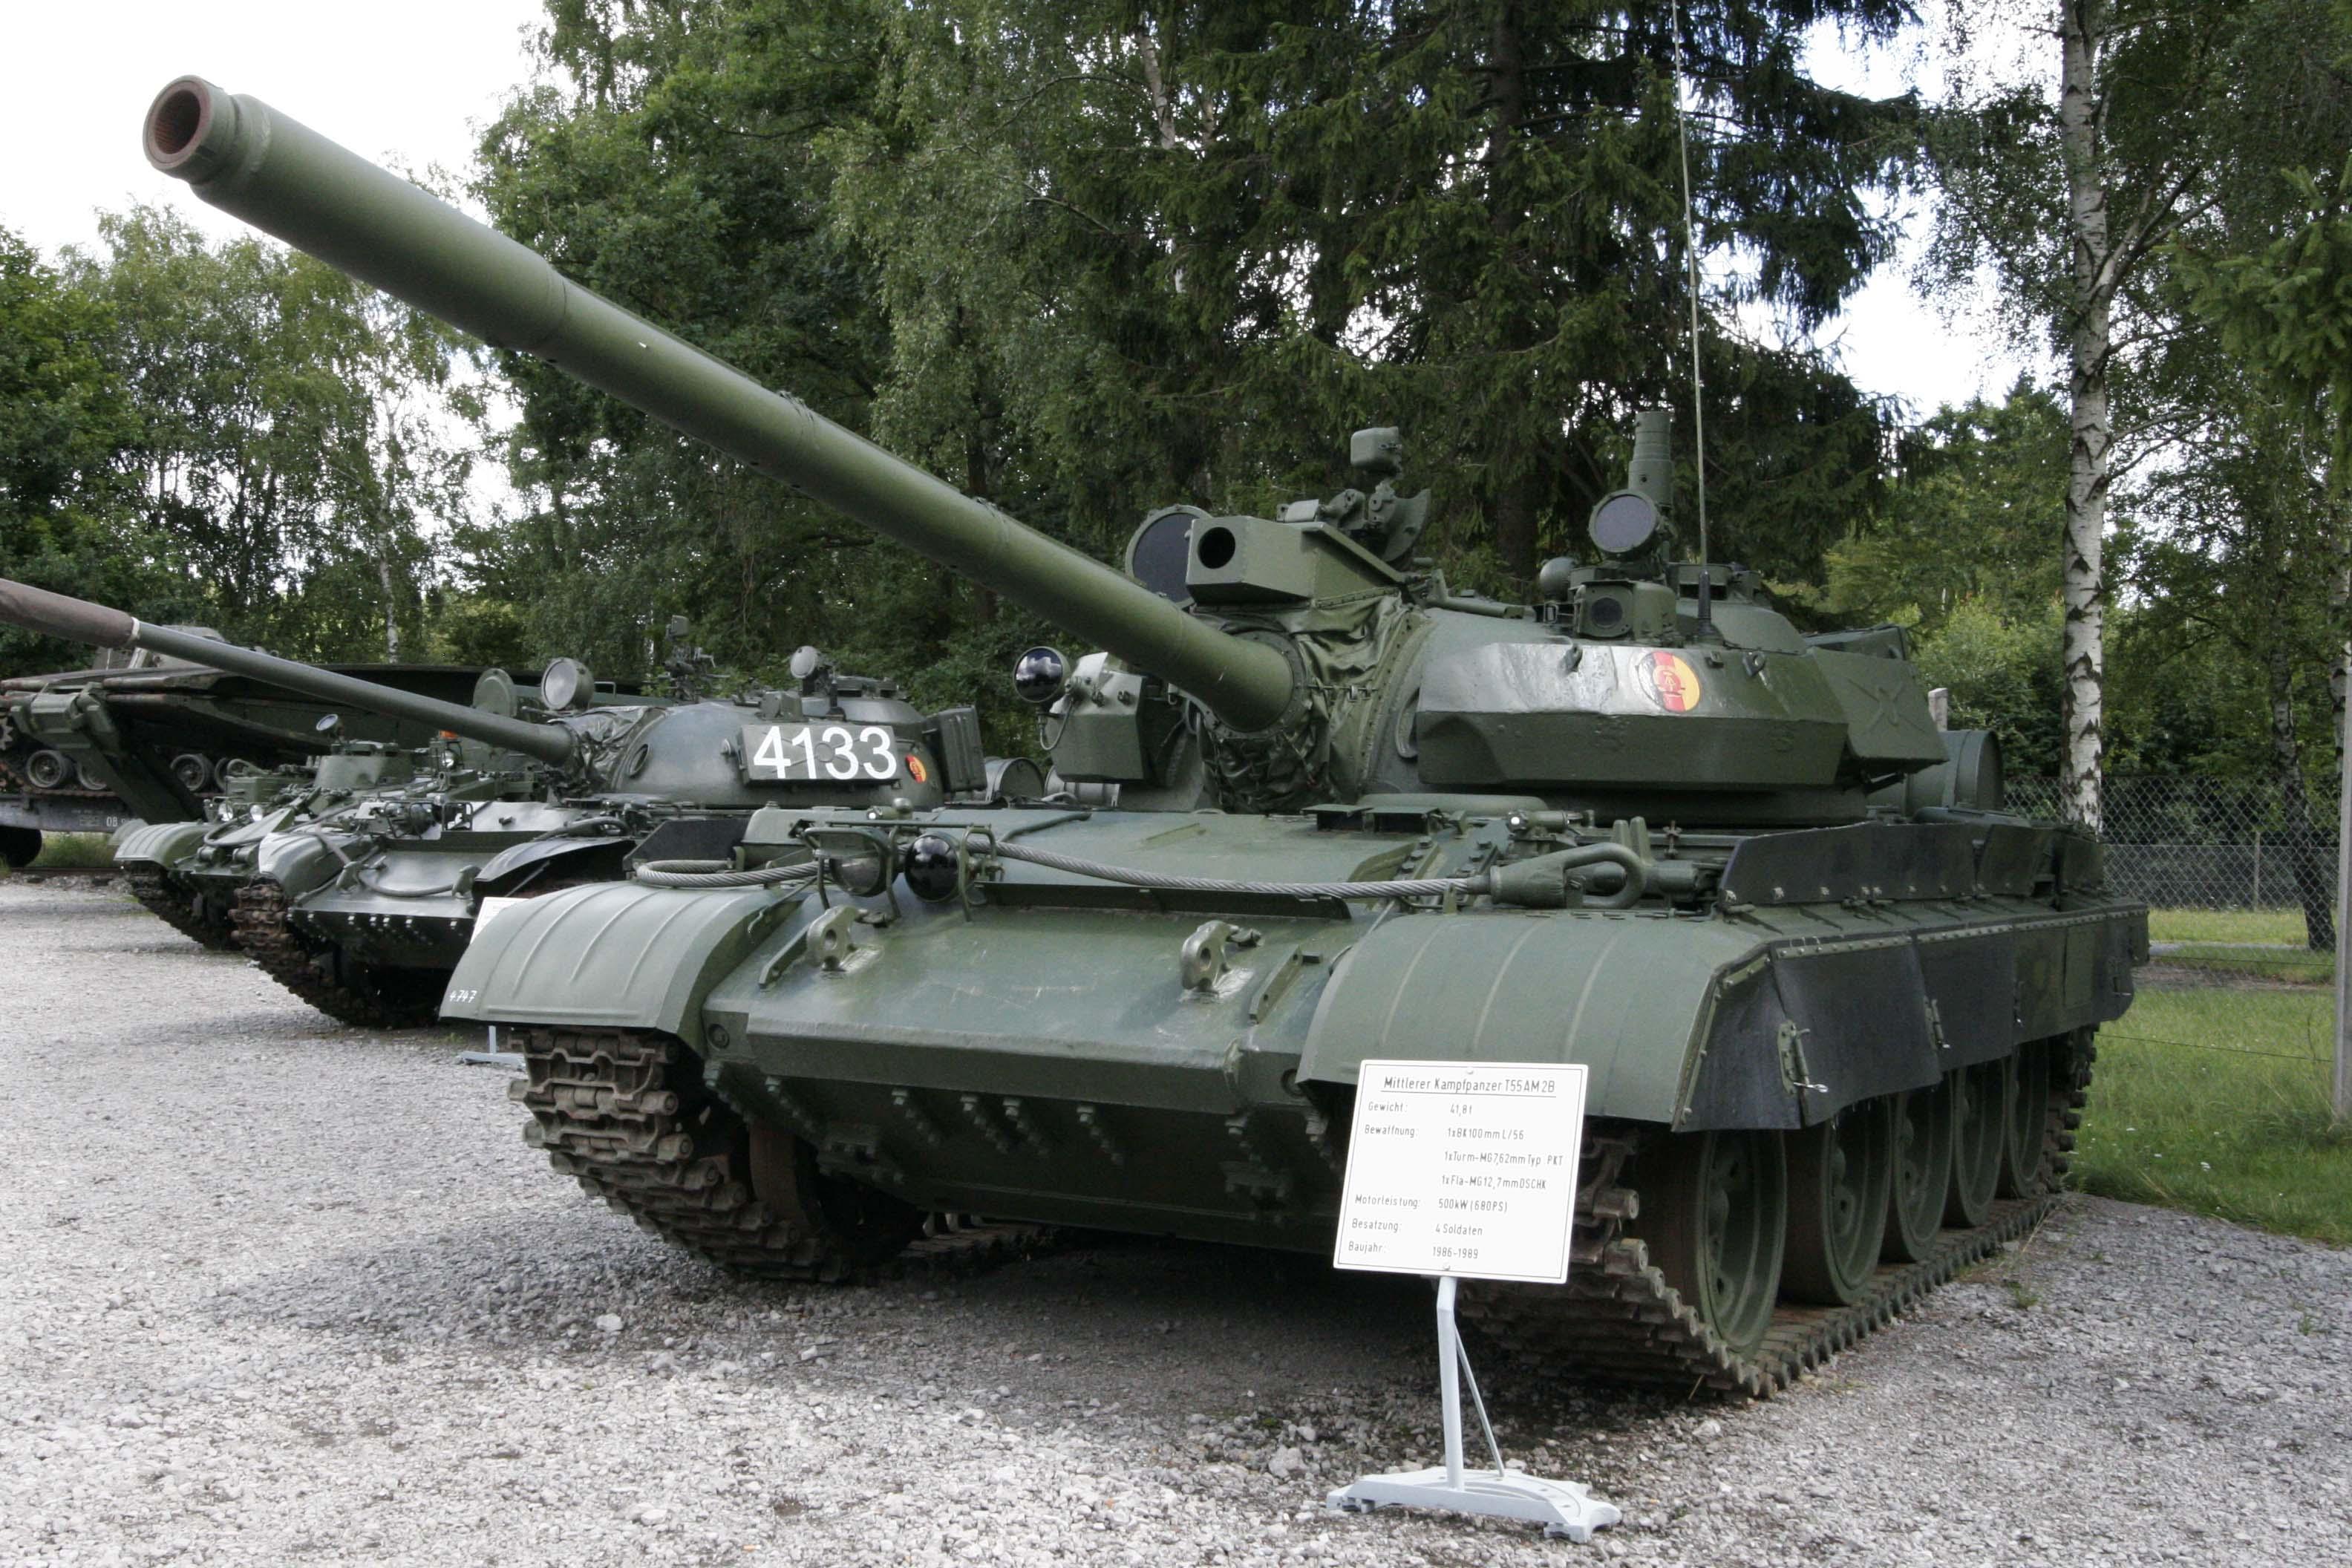 http://upload.wikimedia.org/wikipedia/commons/d/de/T-55AM2B_at_Panzermuseum_Munster.jpg